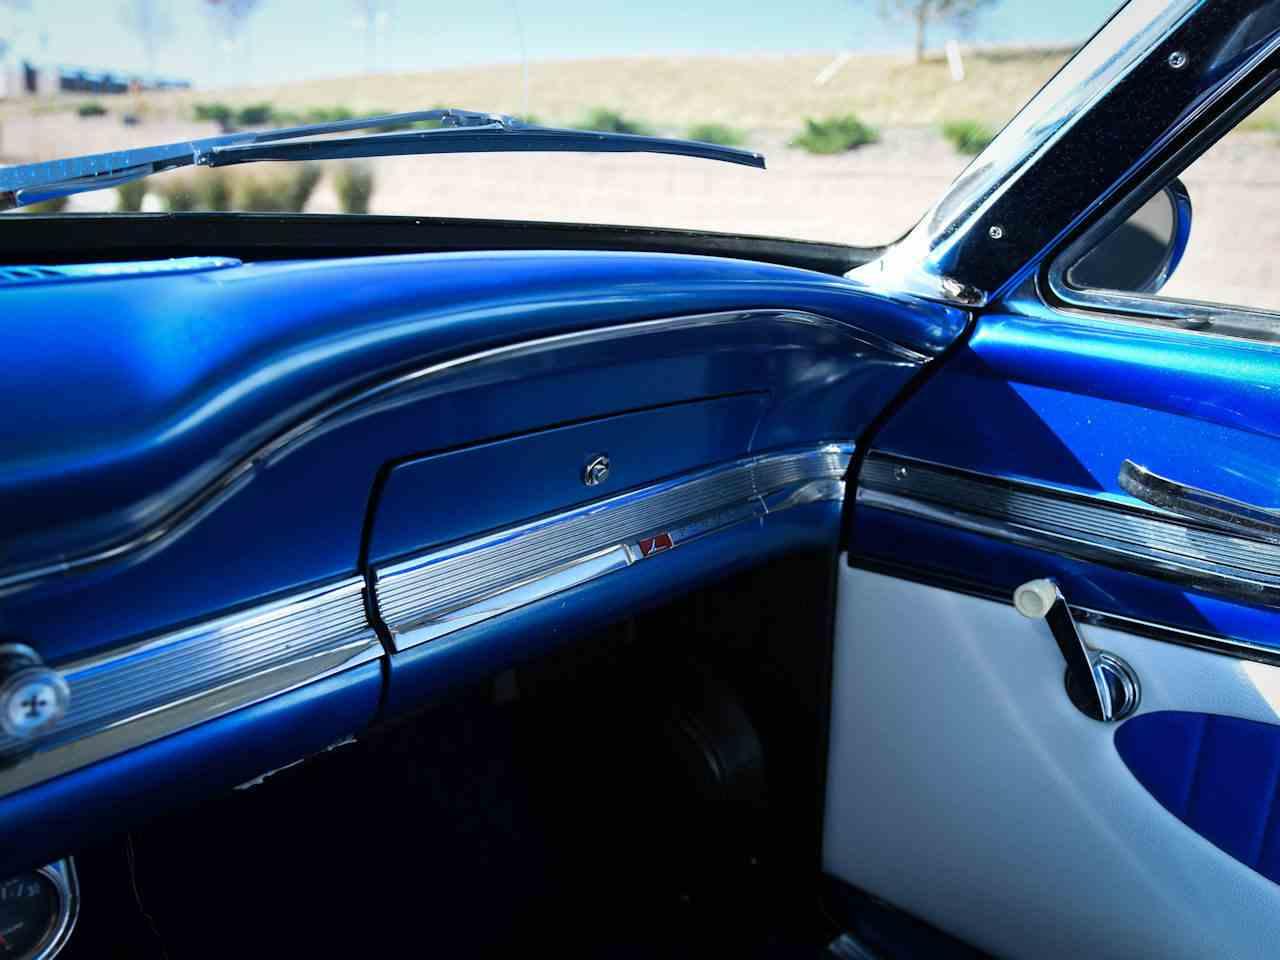 1963 Ford Falcon for Sale | ClassicCars.com | CC-1032716